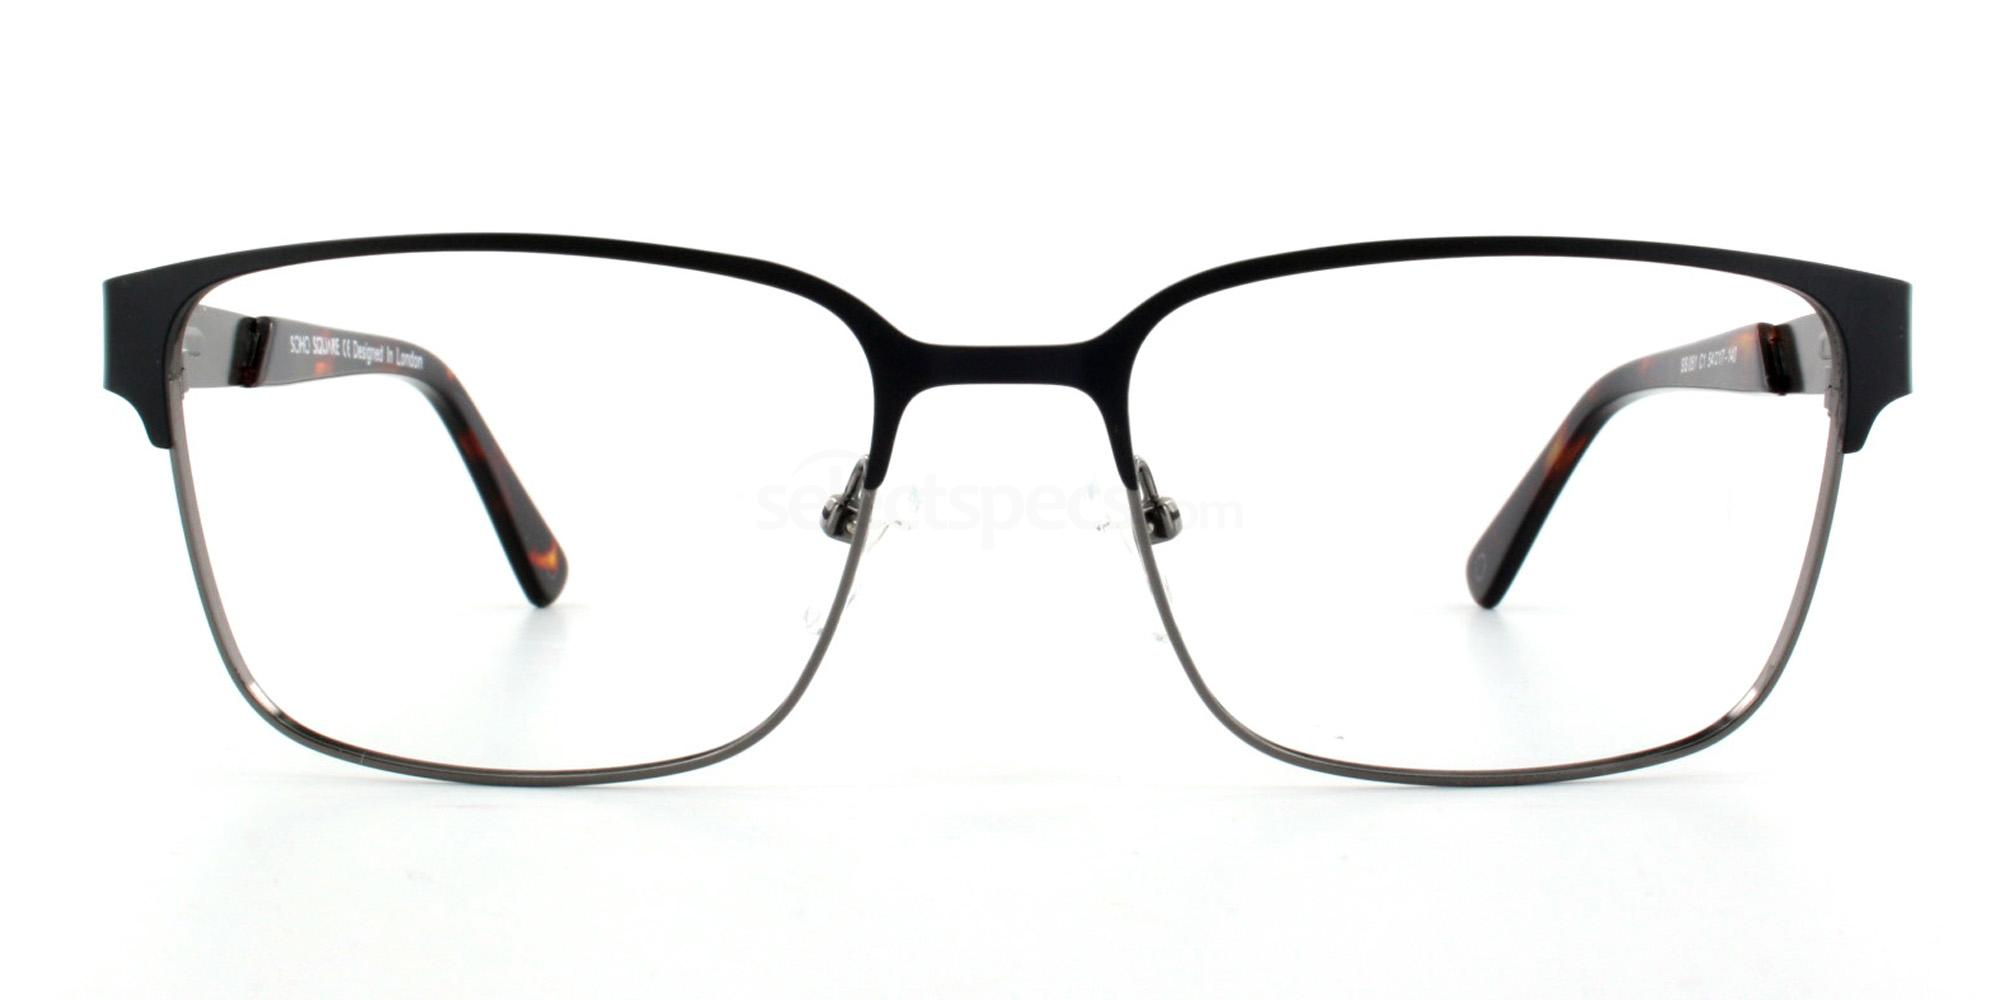 C1 SS 051 Glasses, Soho Square